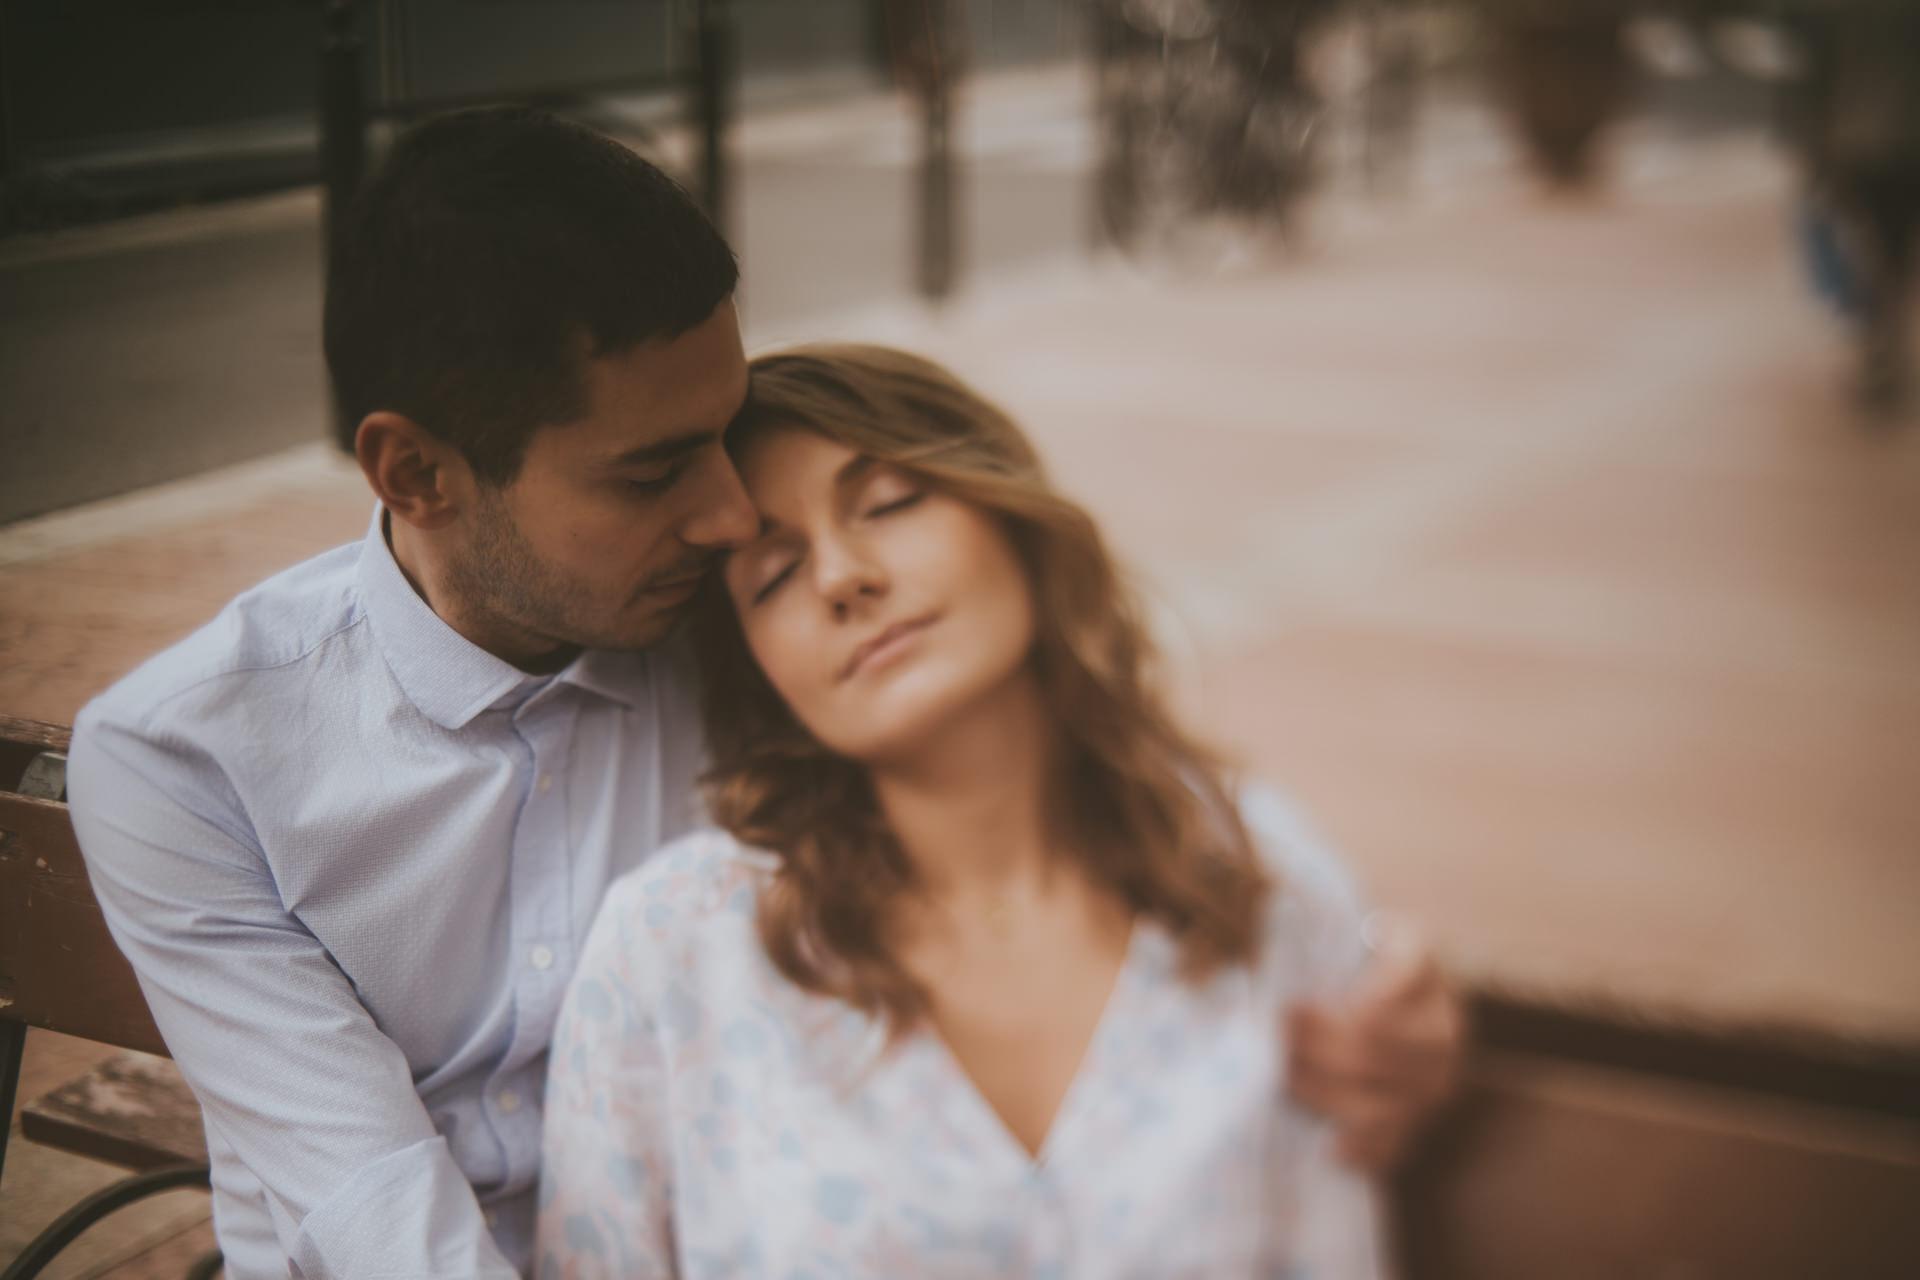 Steven bassilieaux wedding photographer- photographe mariage hyéres bormes les mimosas plage seance couple_-18.jpg